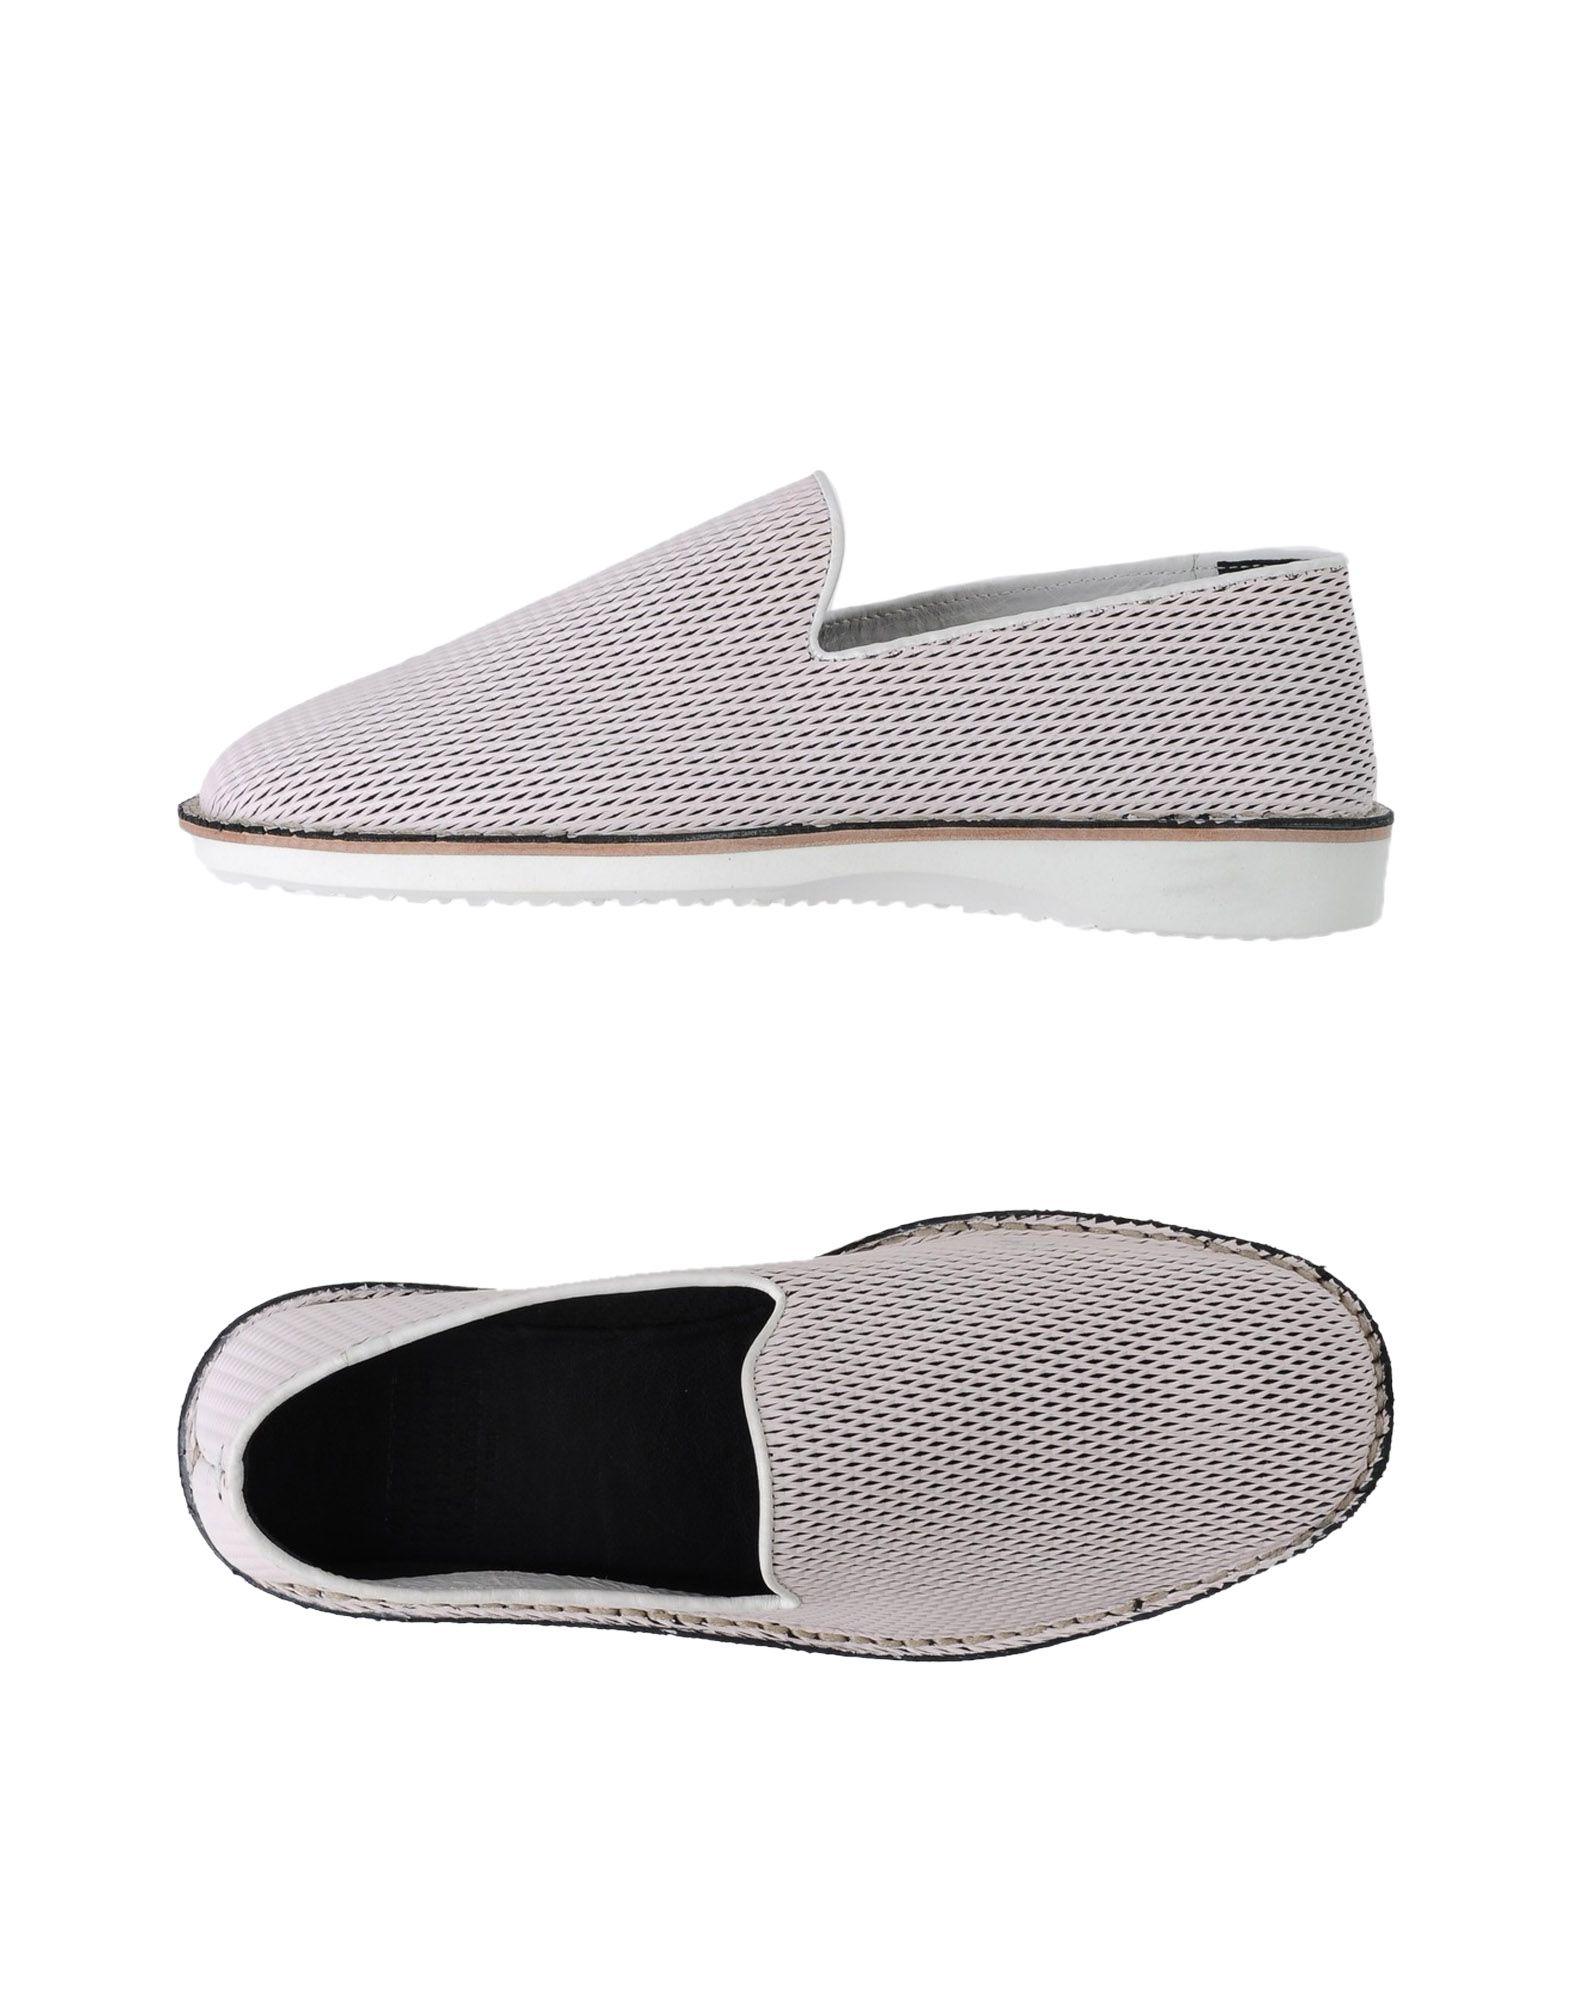 Maison Margiela Mokassins Herren  11340338TQ Gute Qualität beliebte Schuhe